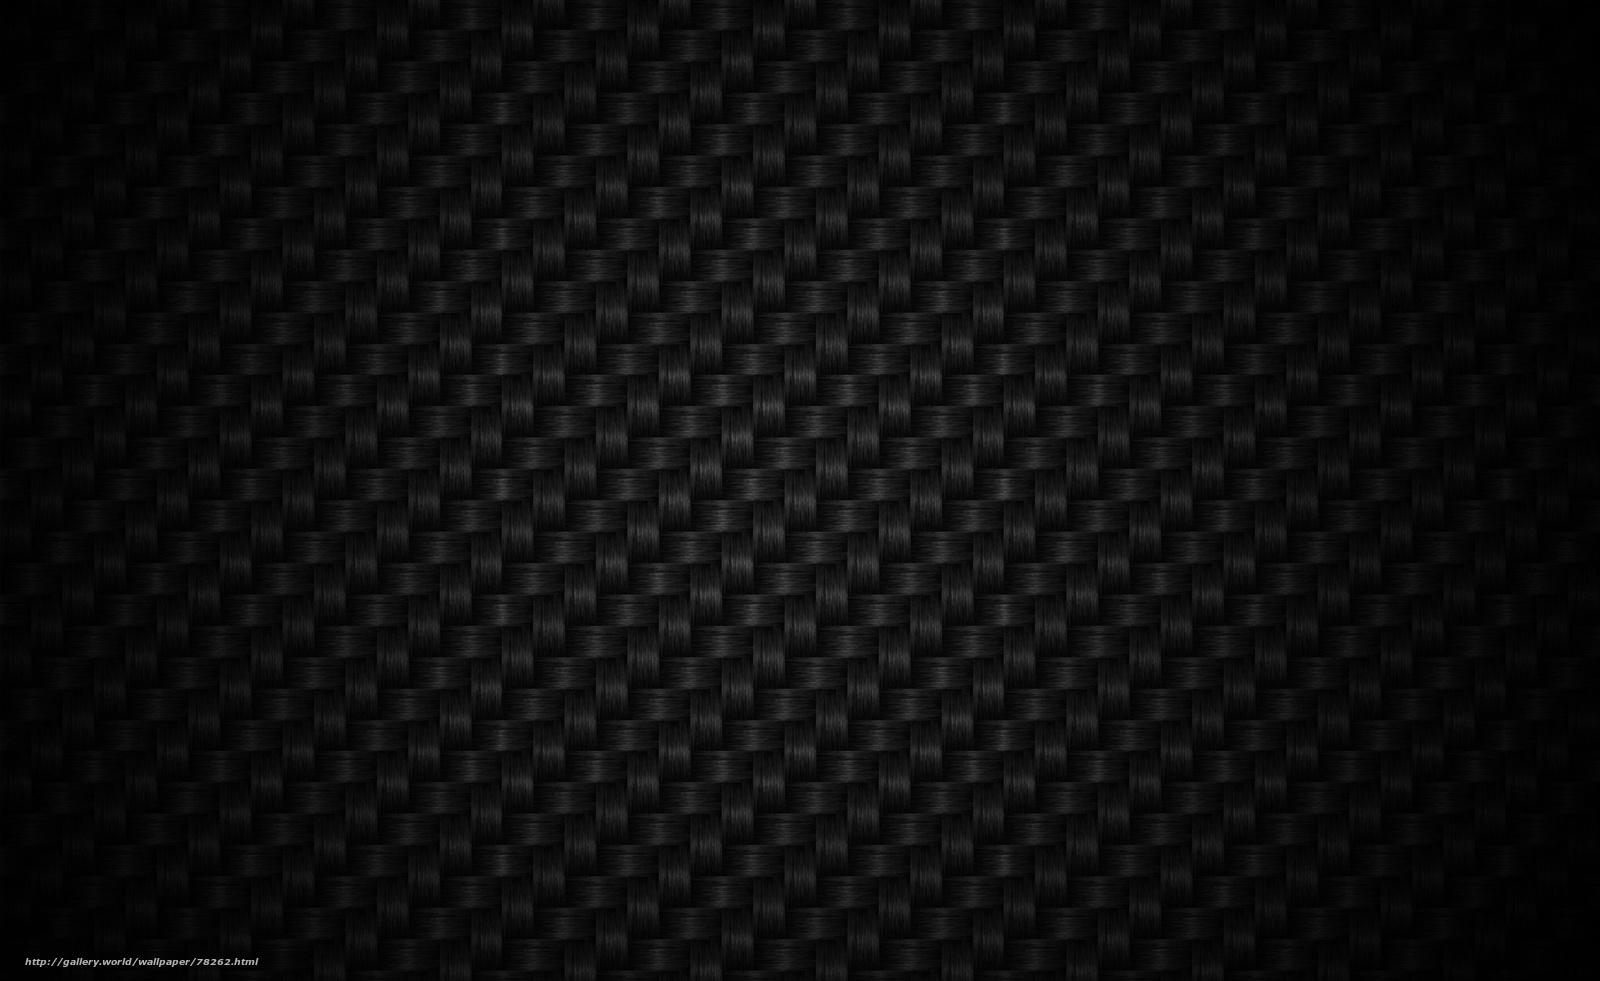 HQ patrones, texturas, negro, fondo de pantalla, 2560x1570 imagen ...